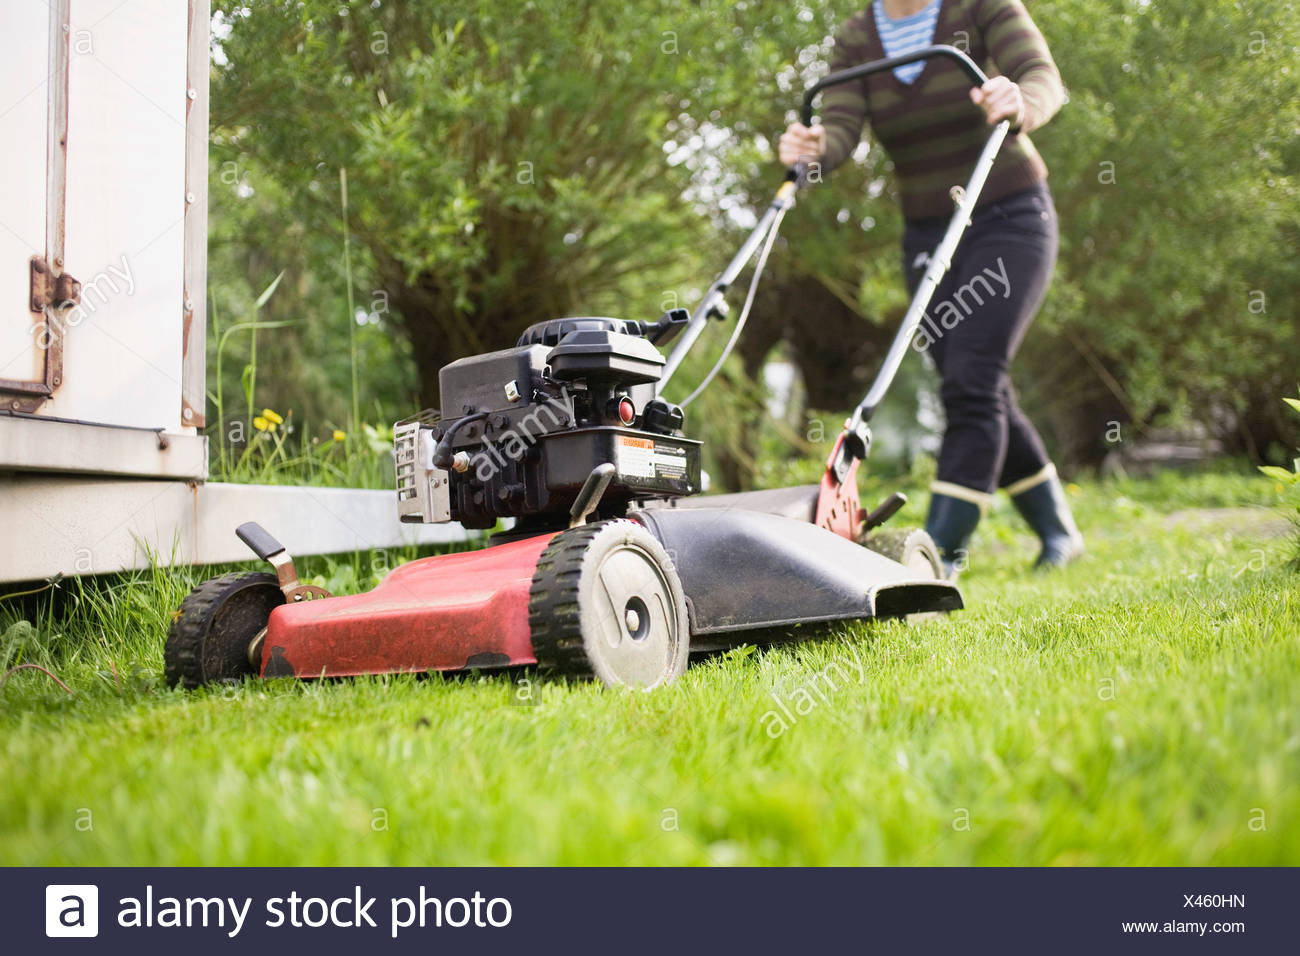 Women pulls a lawnmower - Stock Image